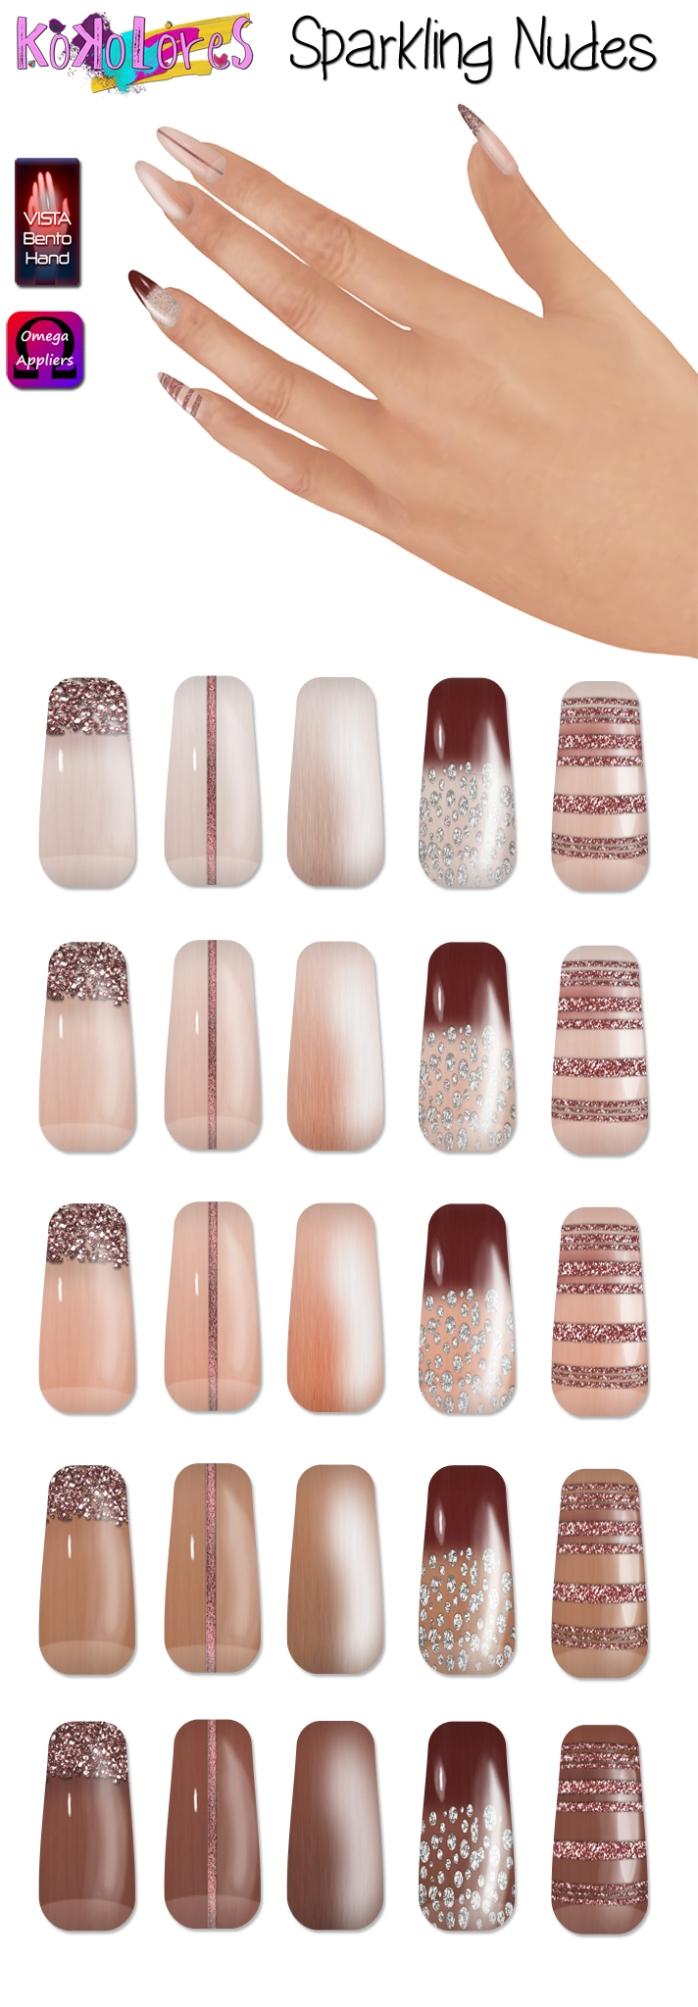 [KoKoLoReS] Sparkling Nudes nail appliers